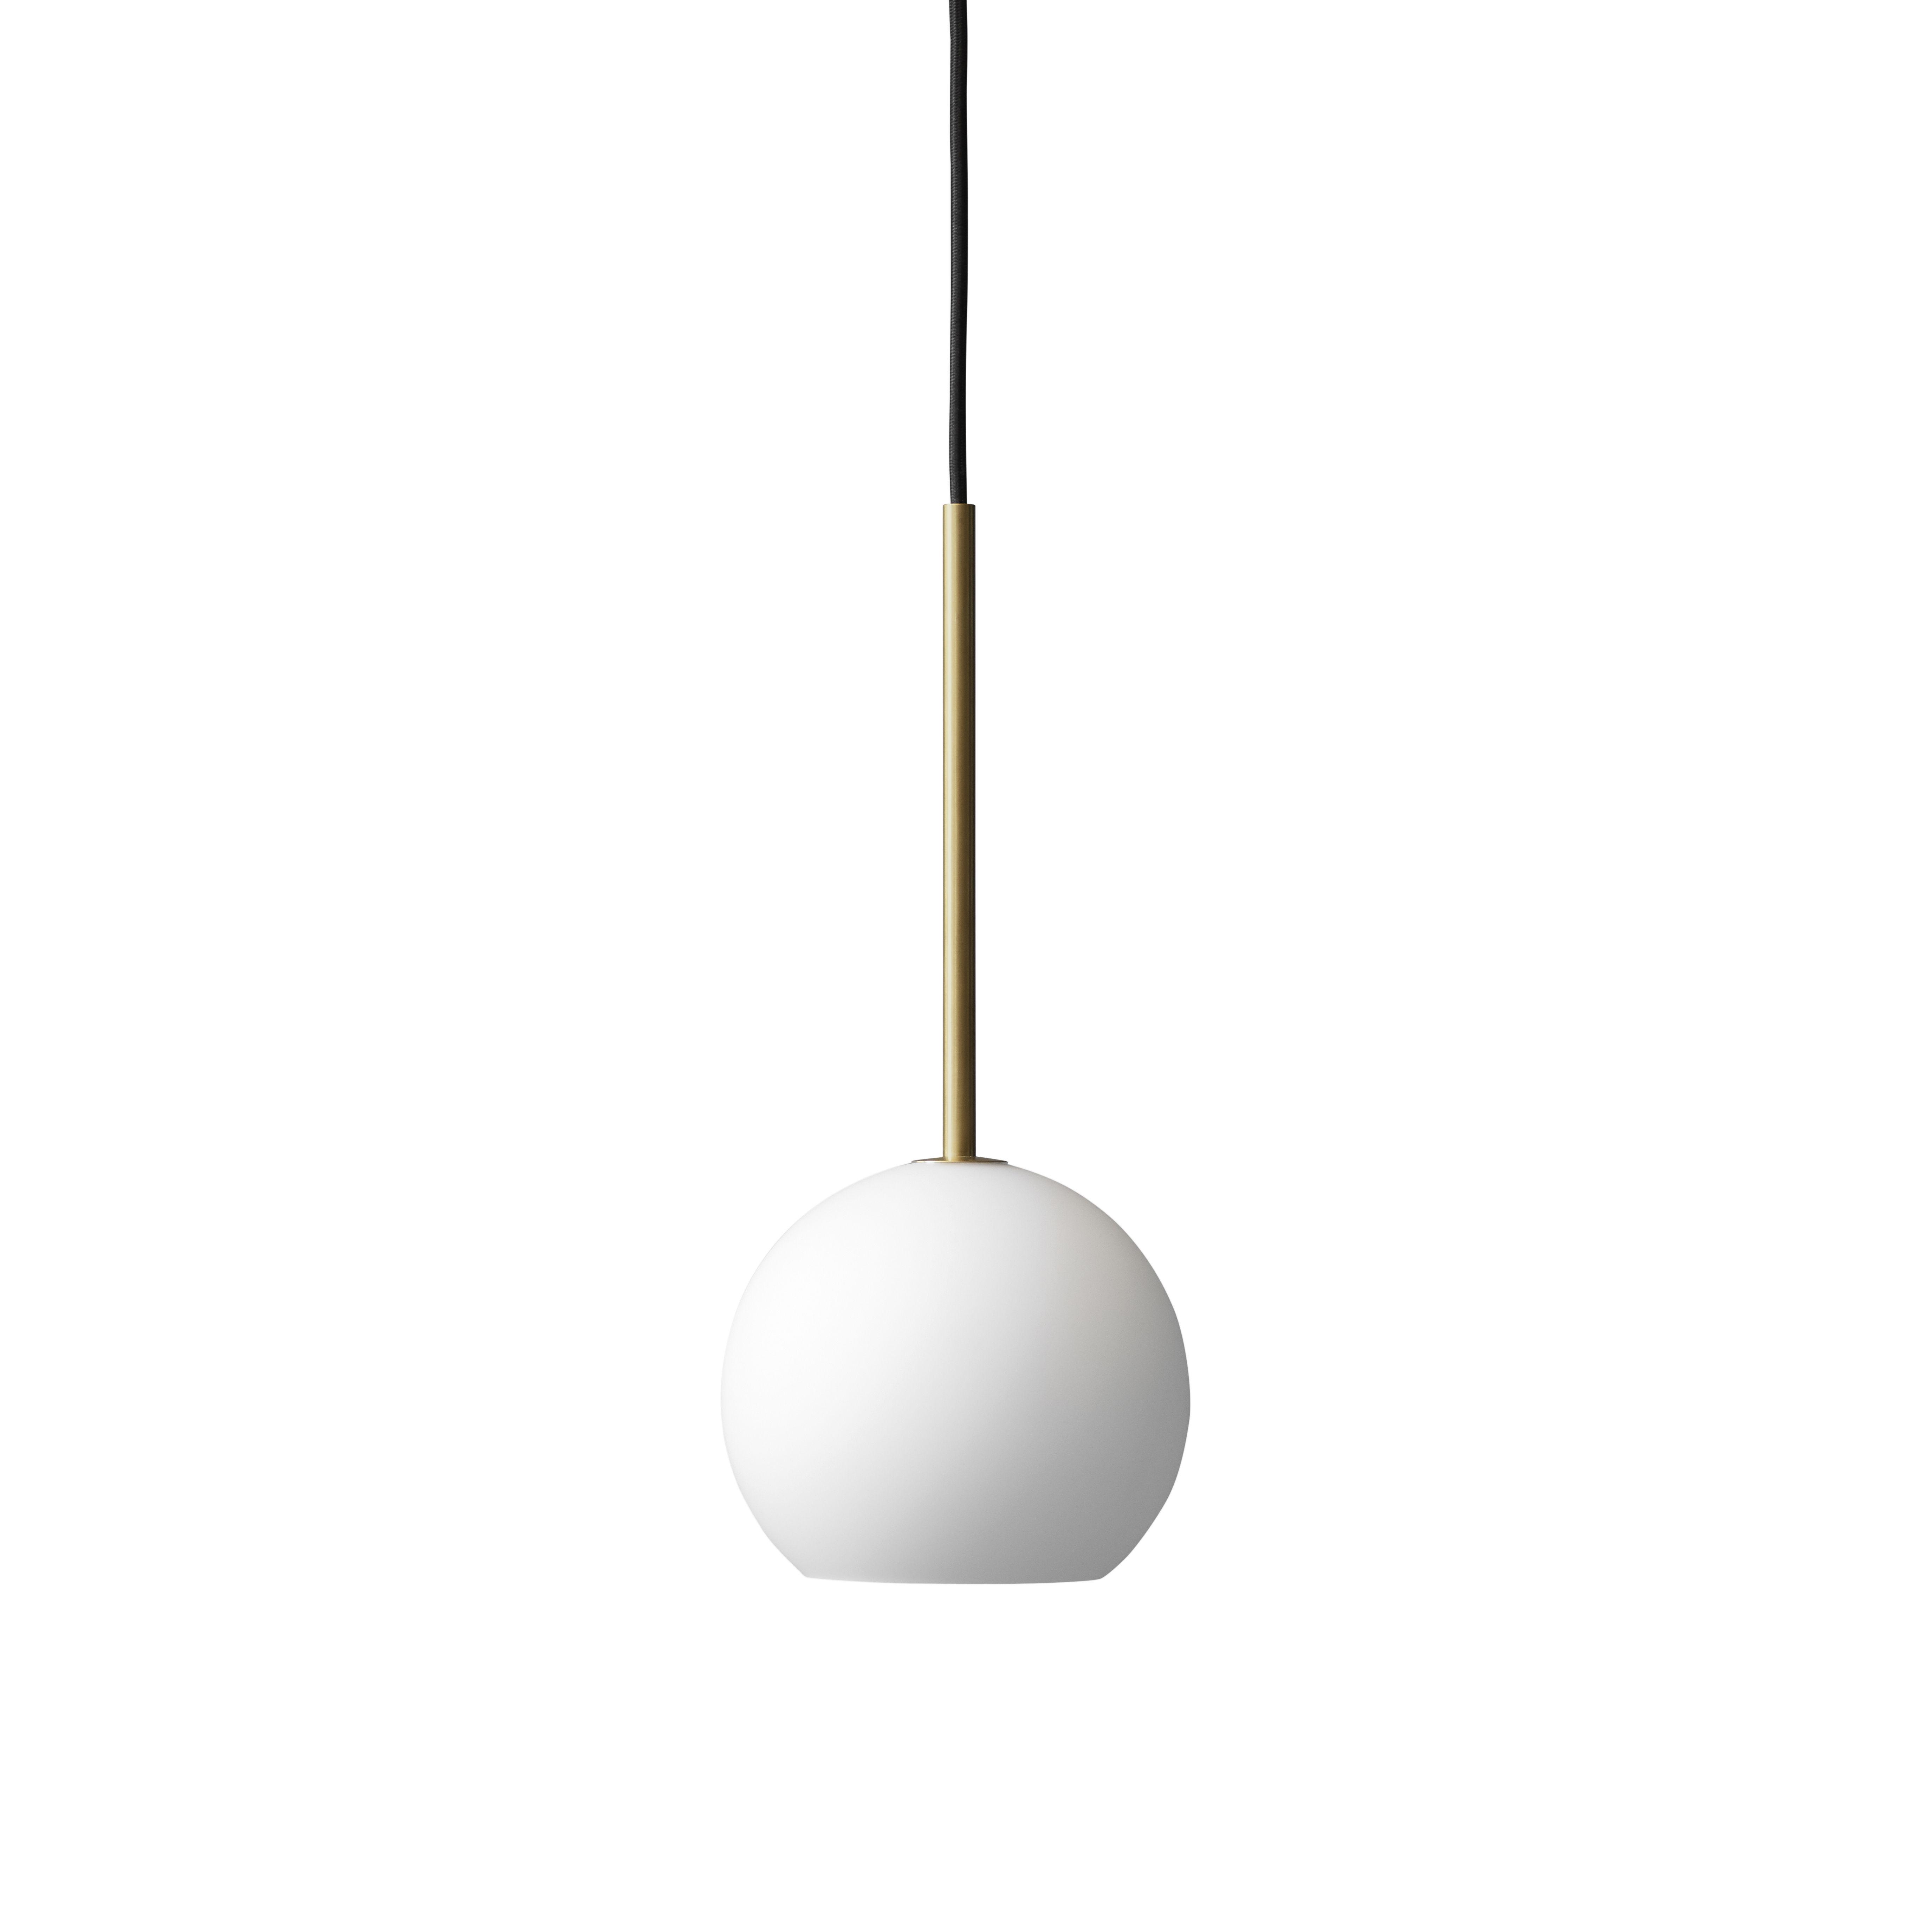 Luminaire - Suspensions - Suspension Ice SR3 / Ø 14 cm - Verre - &tradition - Blanc / Laiton - Laiton, Tissu, Verre soufflé bouche